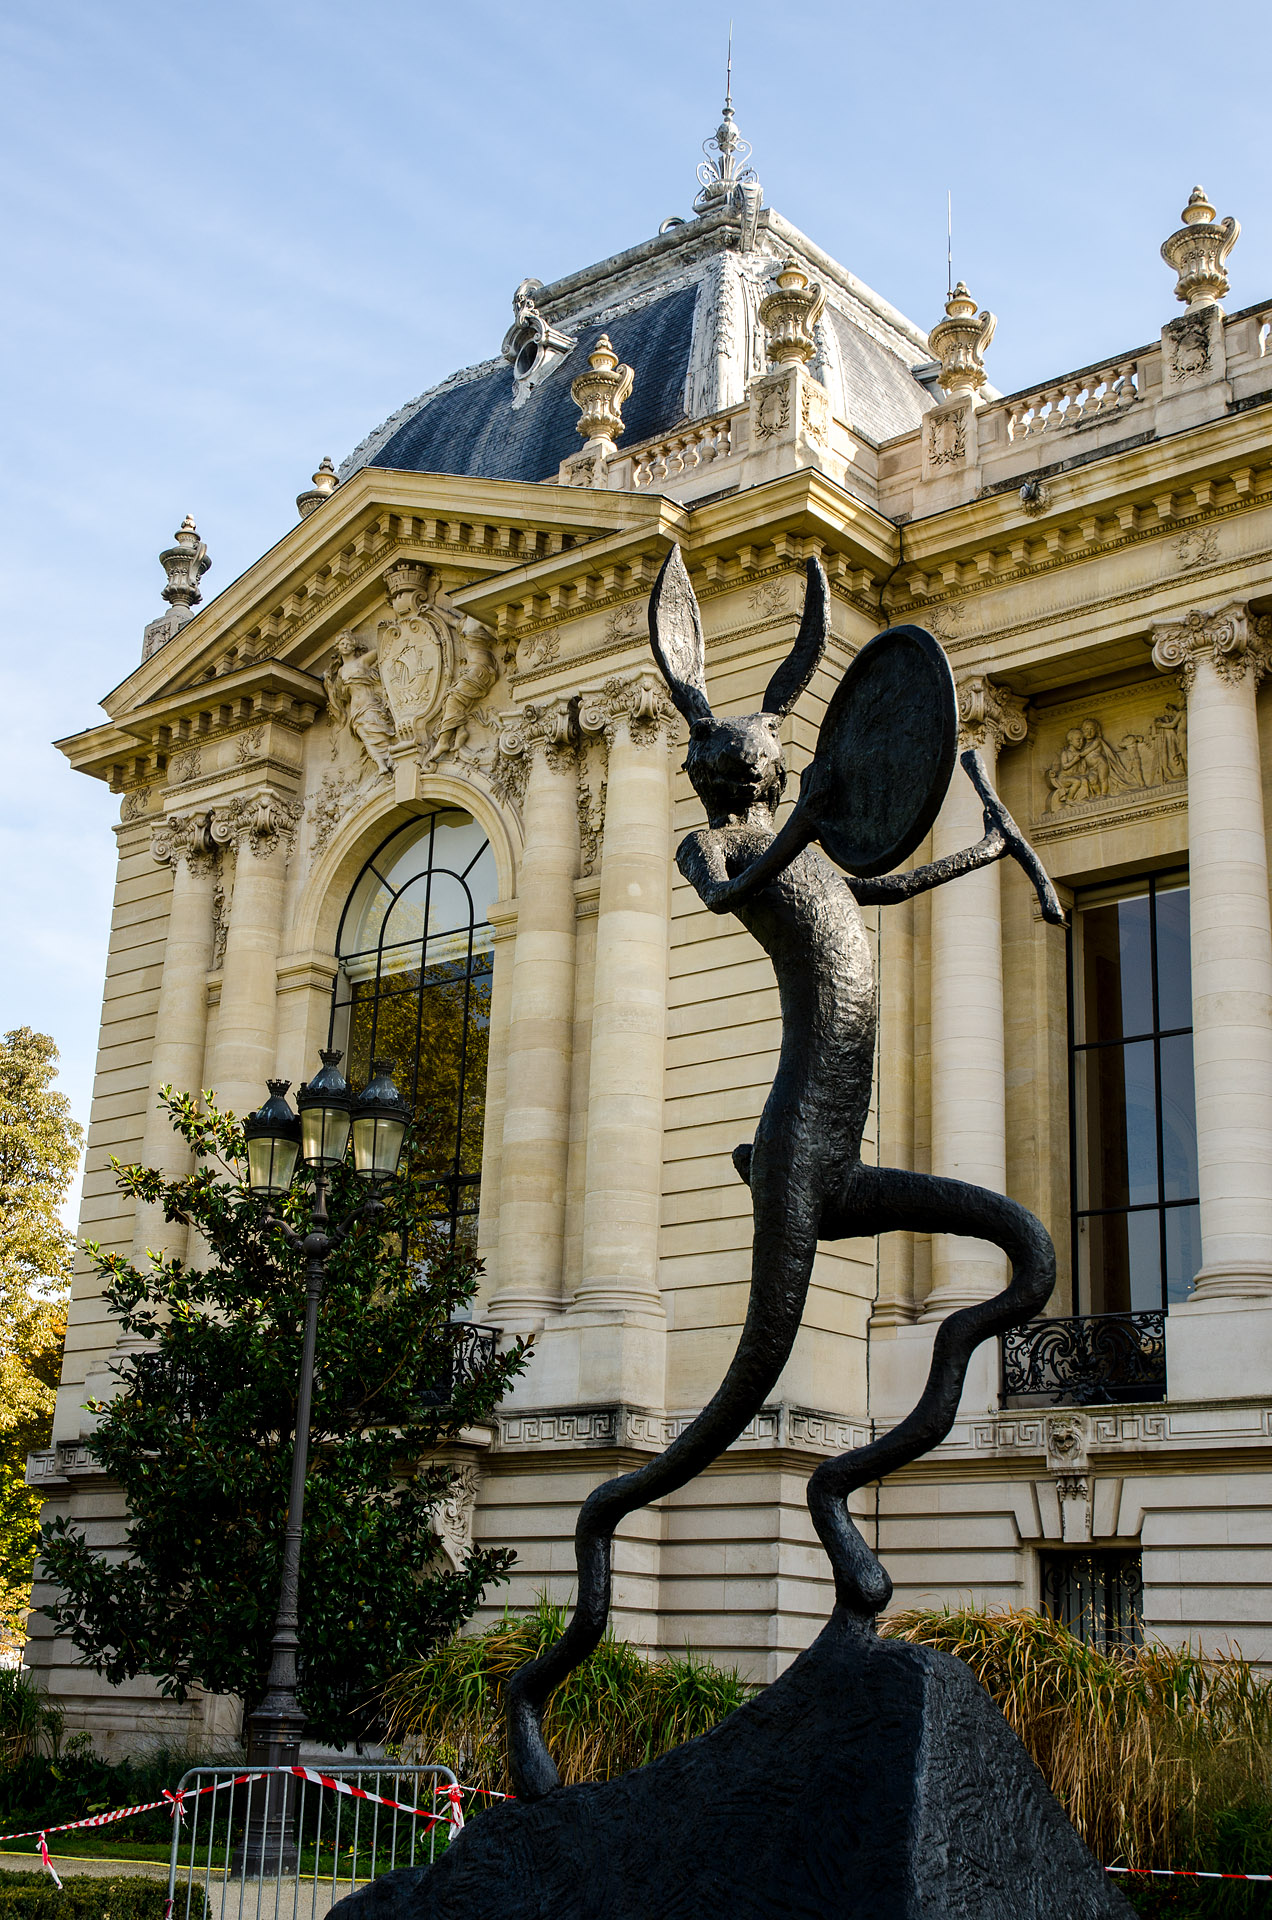 Statue outside the Petit Palais